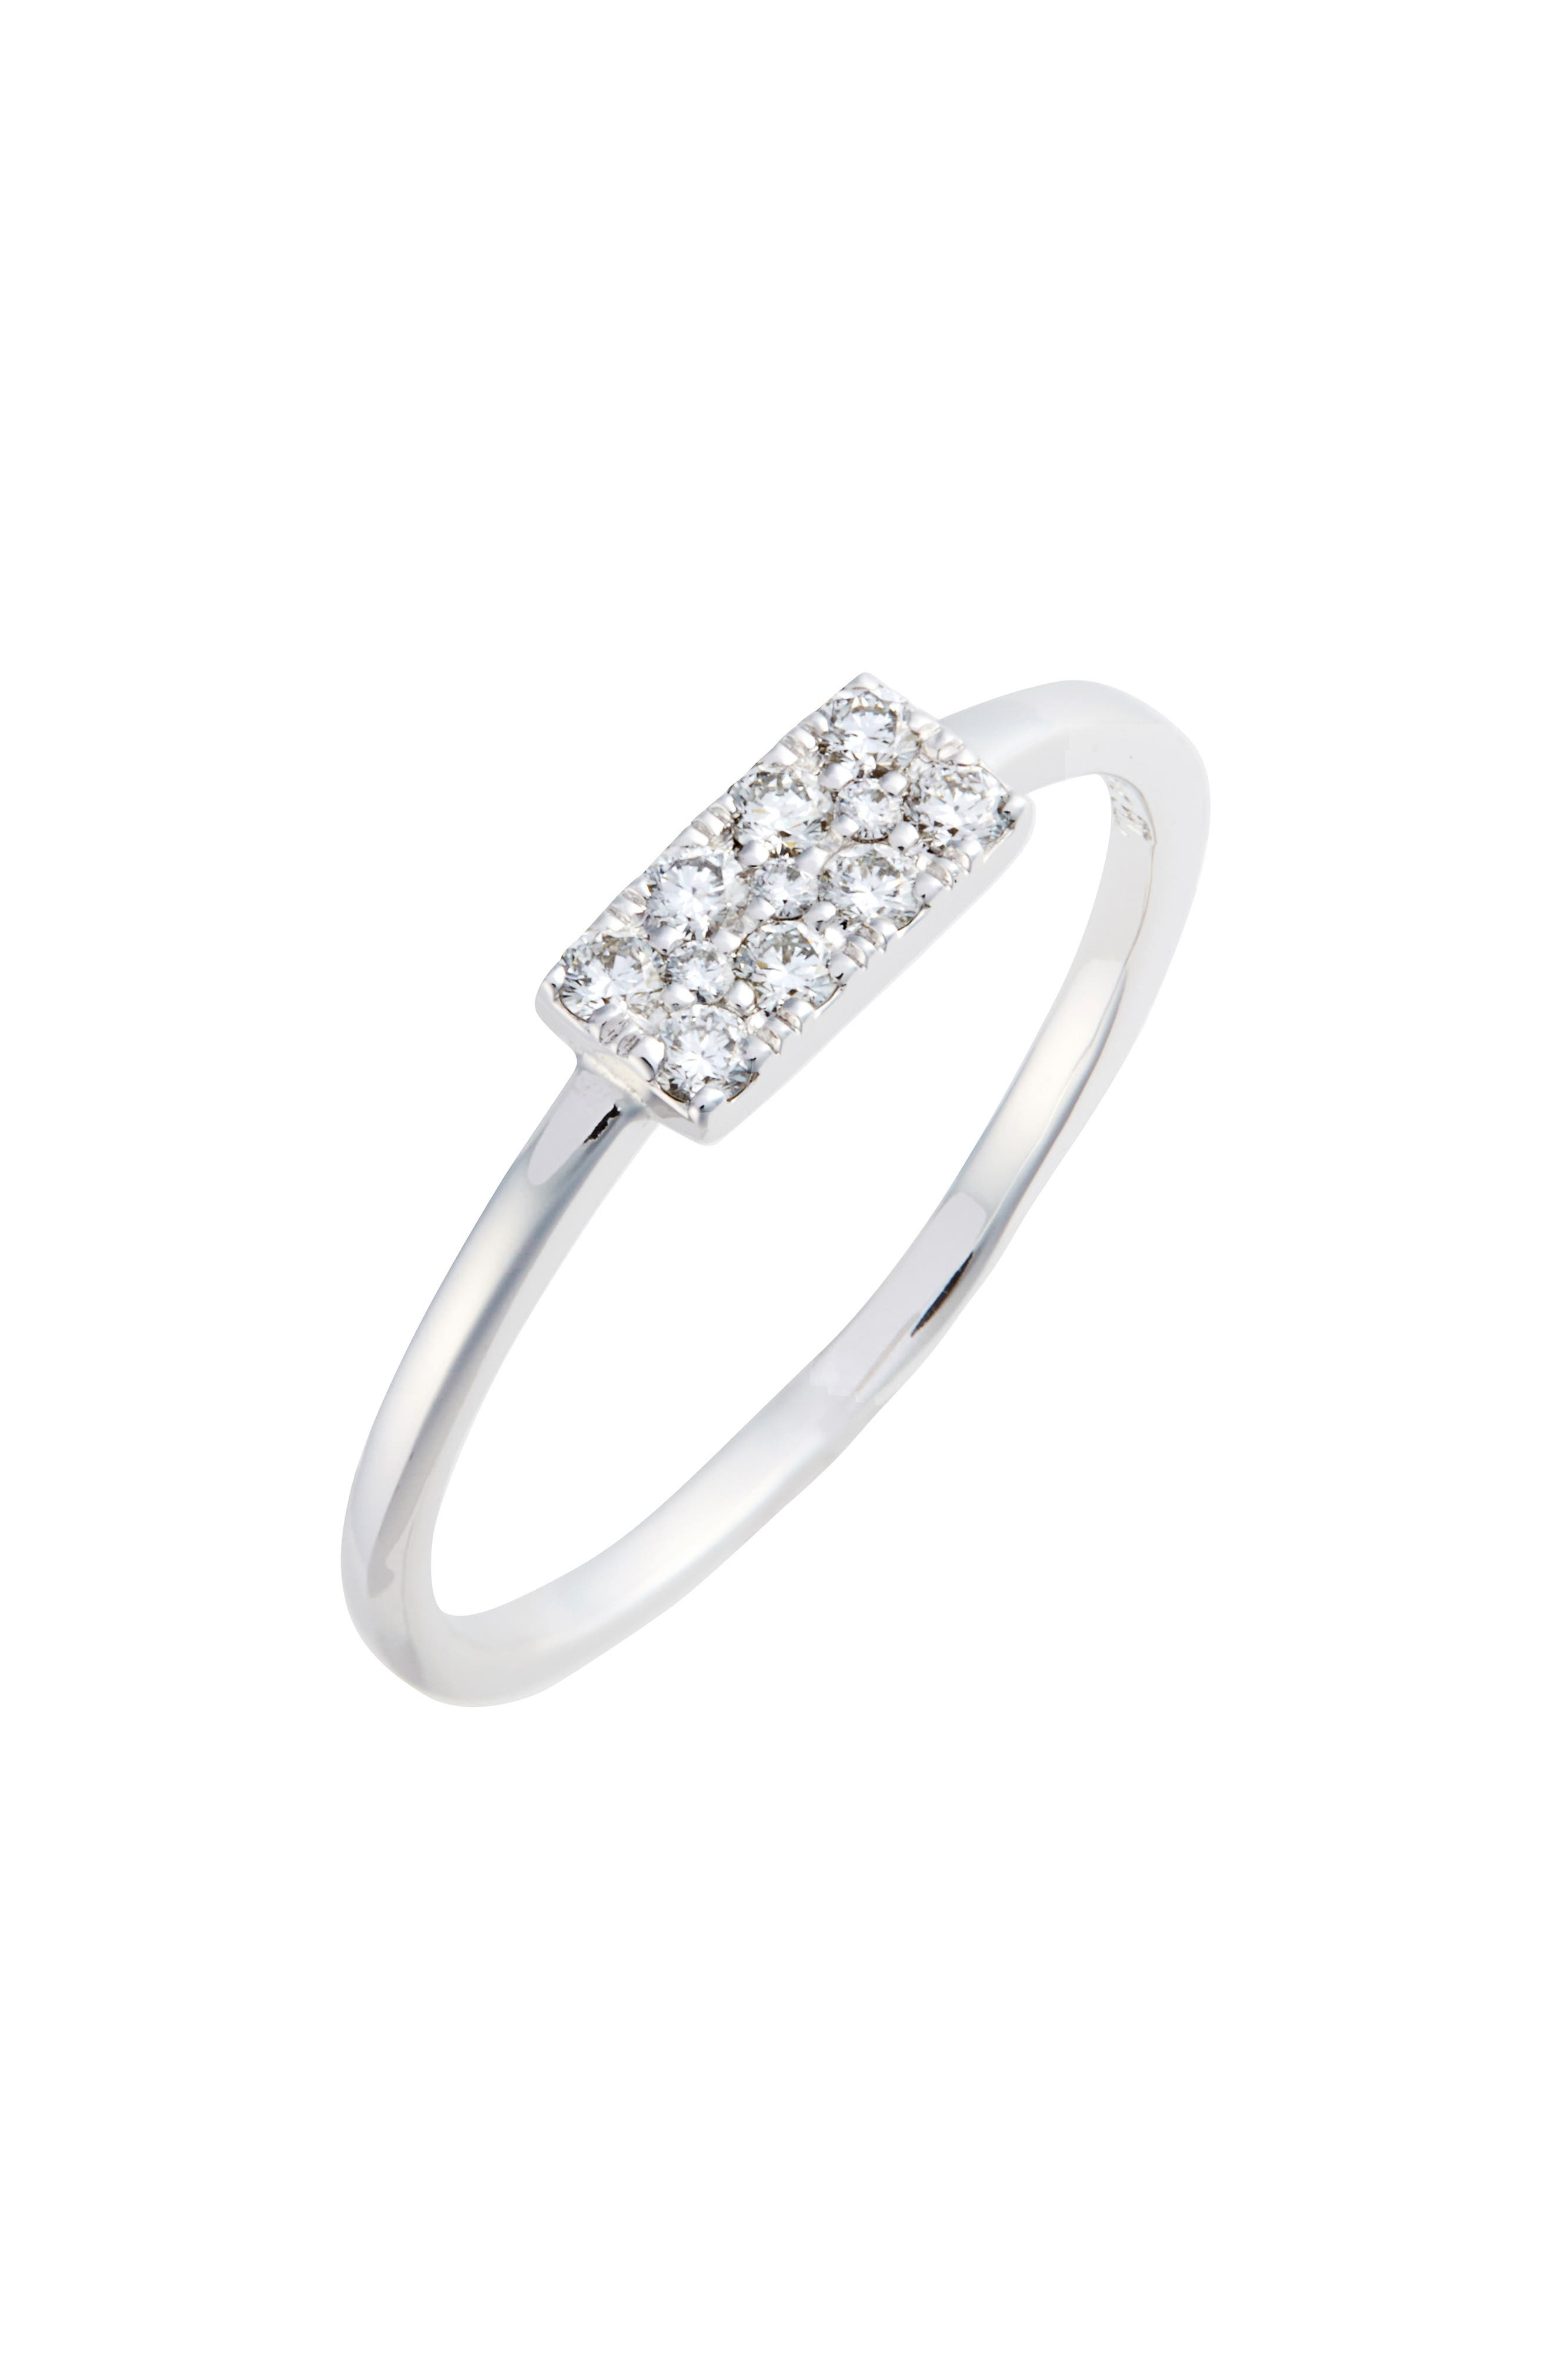 Diamond Rectangle Stacking Ring,                             Main thumbnail 1, color,                             WHITE GOLD/ DIAMOND